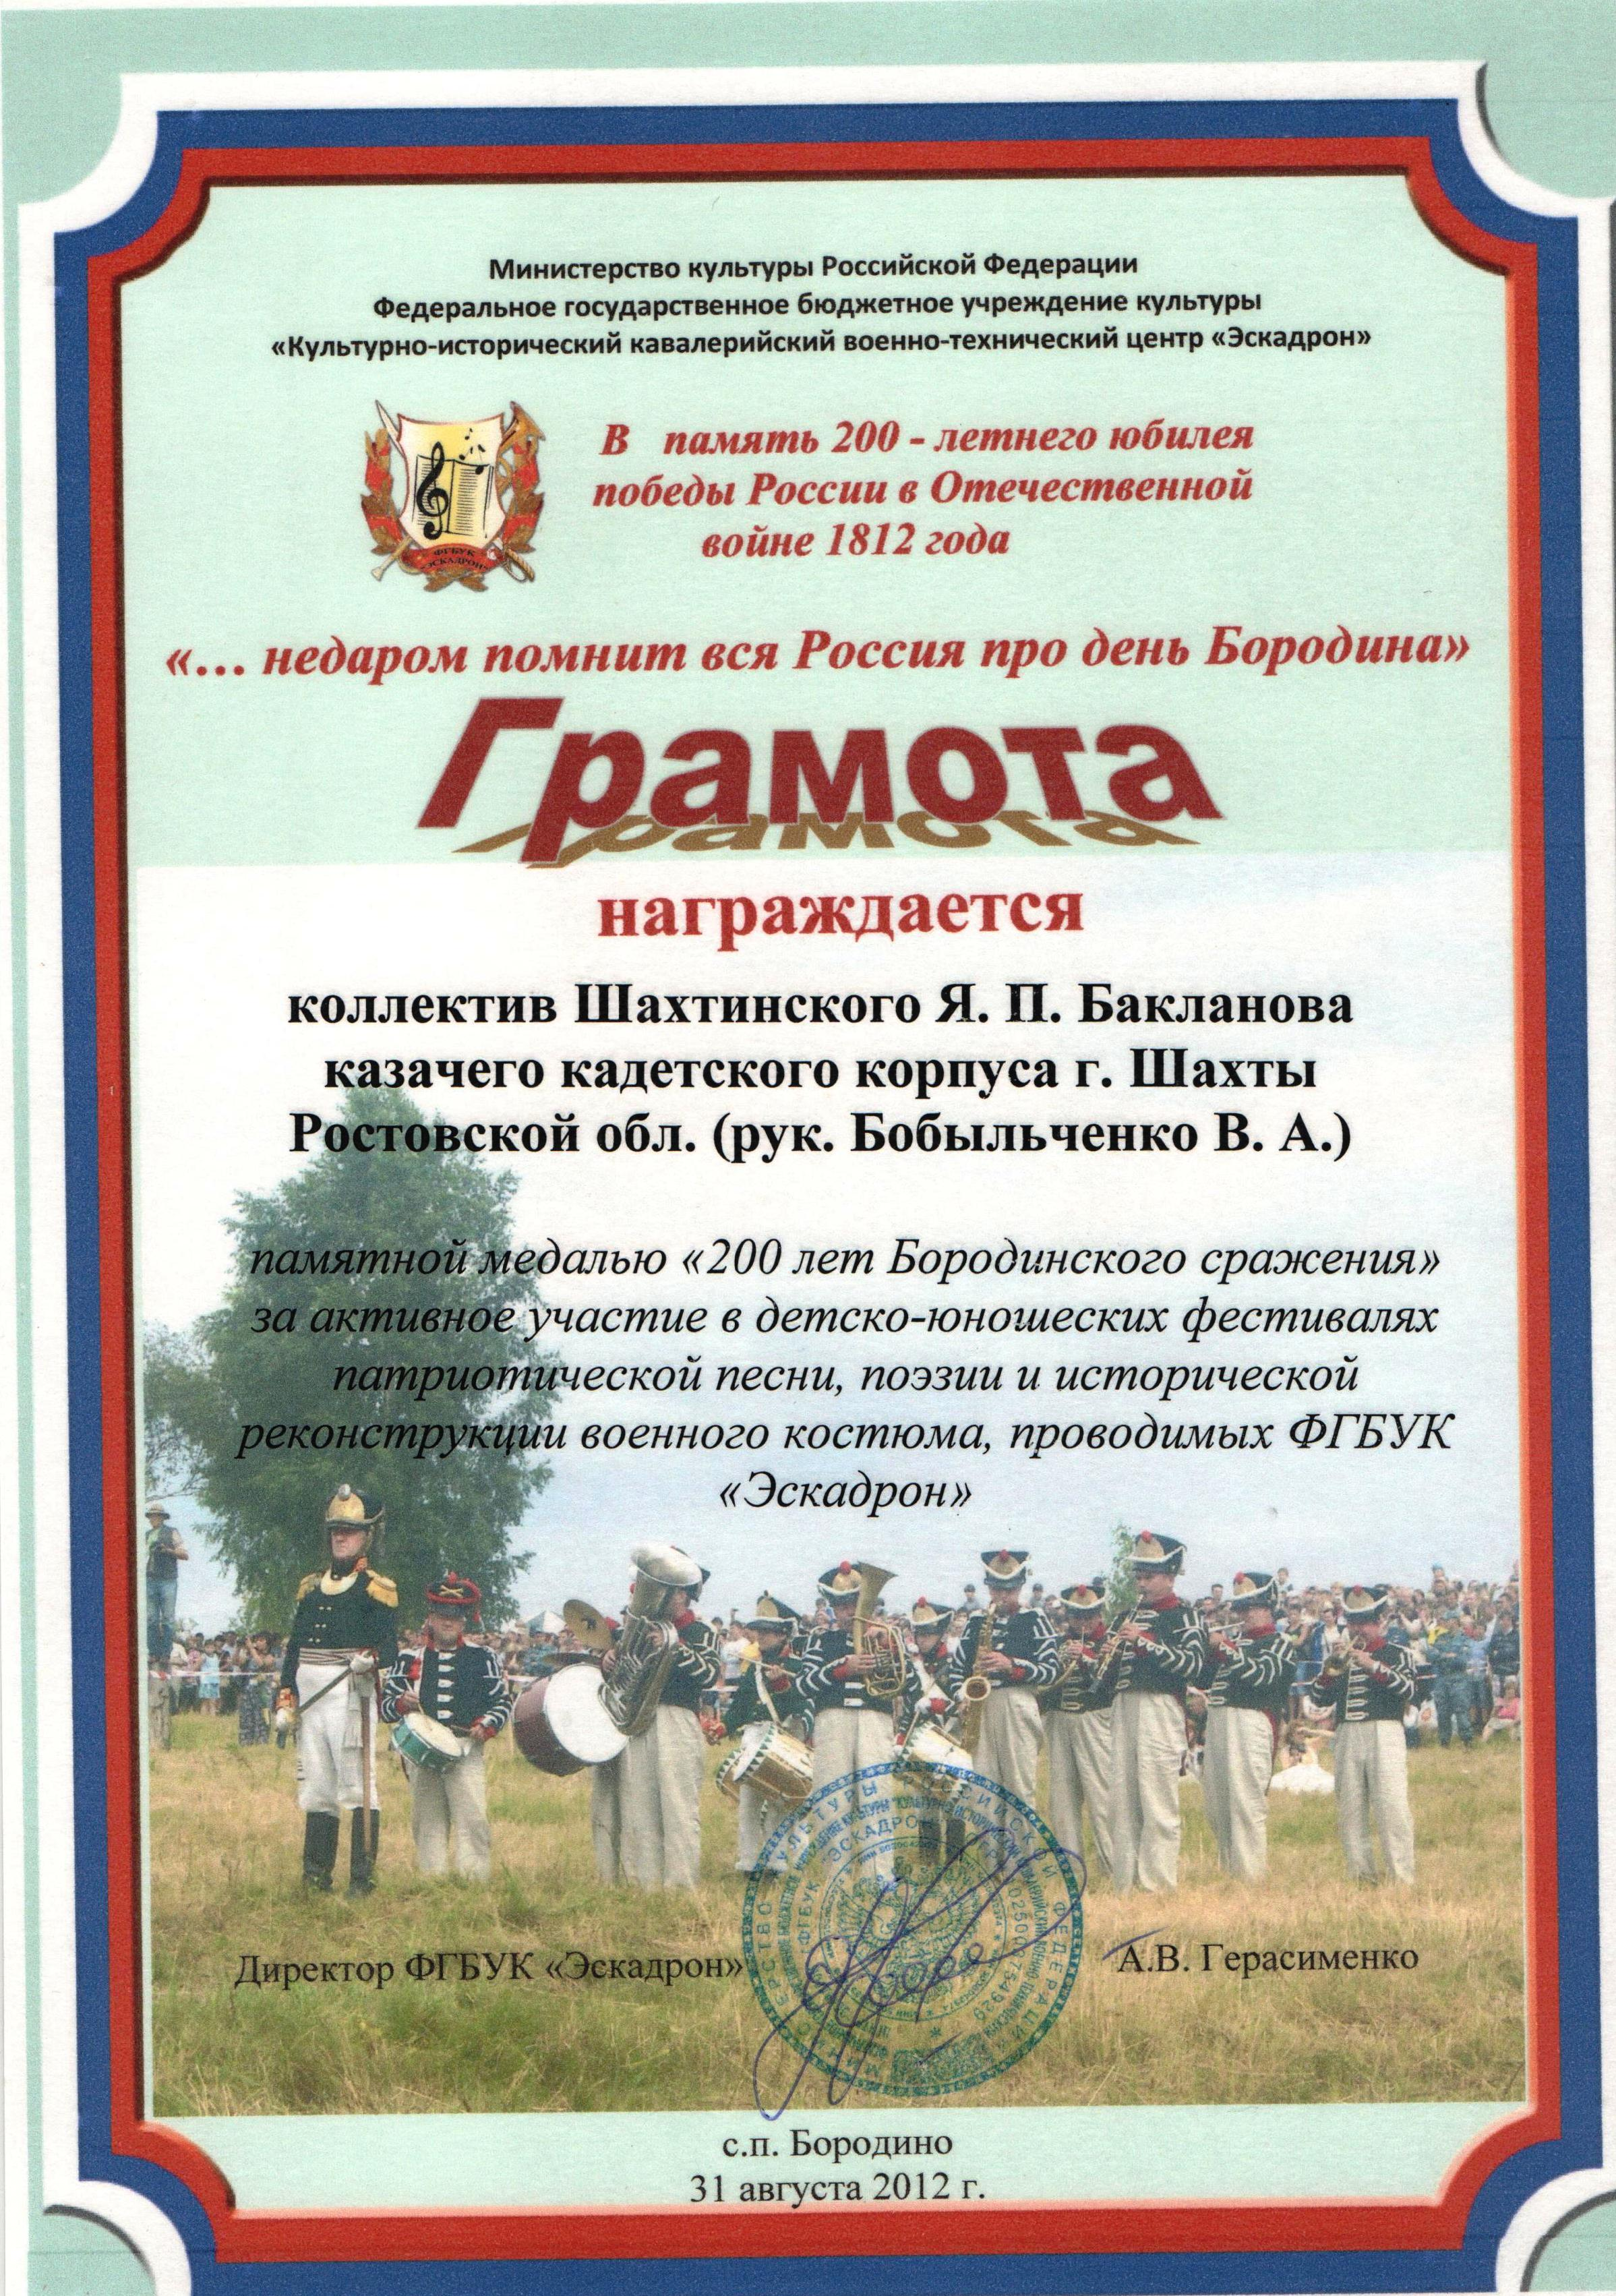 щдлорпавы 001